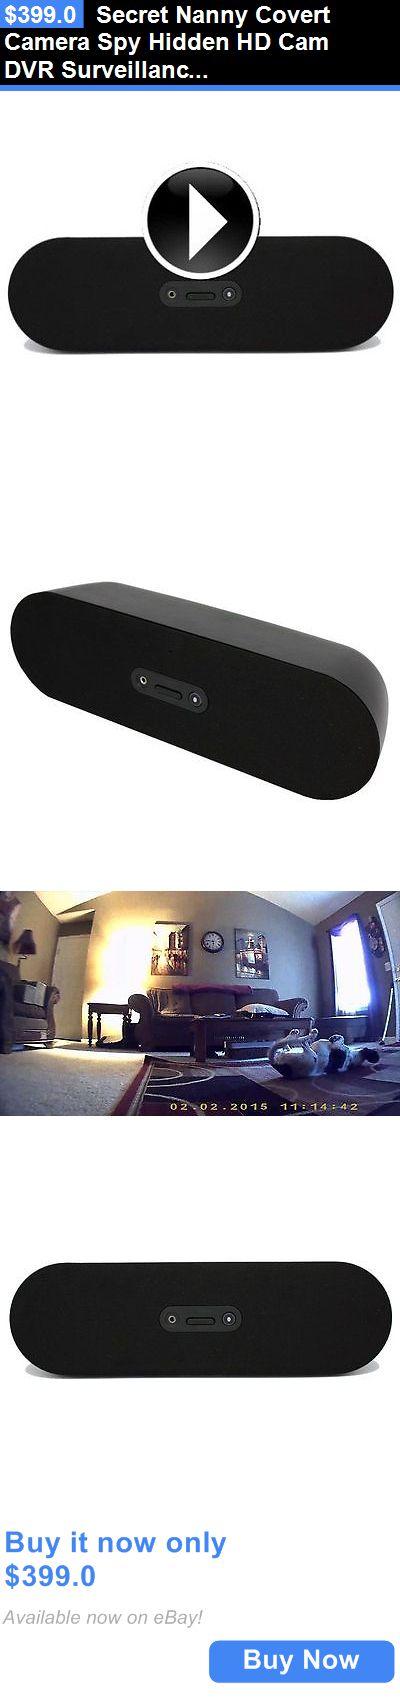 Surveillance Gadgets: Secret Nanny Covert Camera Spy Hidden Hd Cam Dvr Surveillance Bluetooth Speaker BUY IT NOW ONLY: $399.0